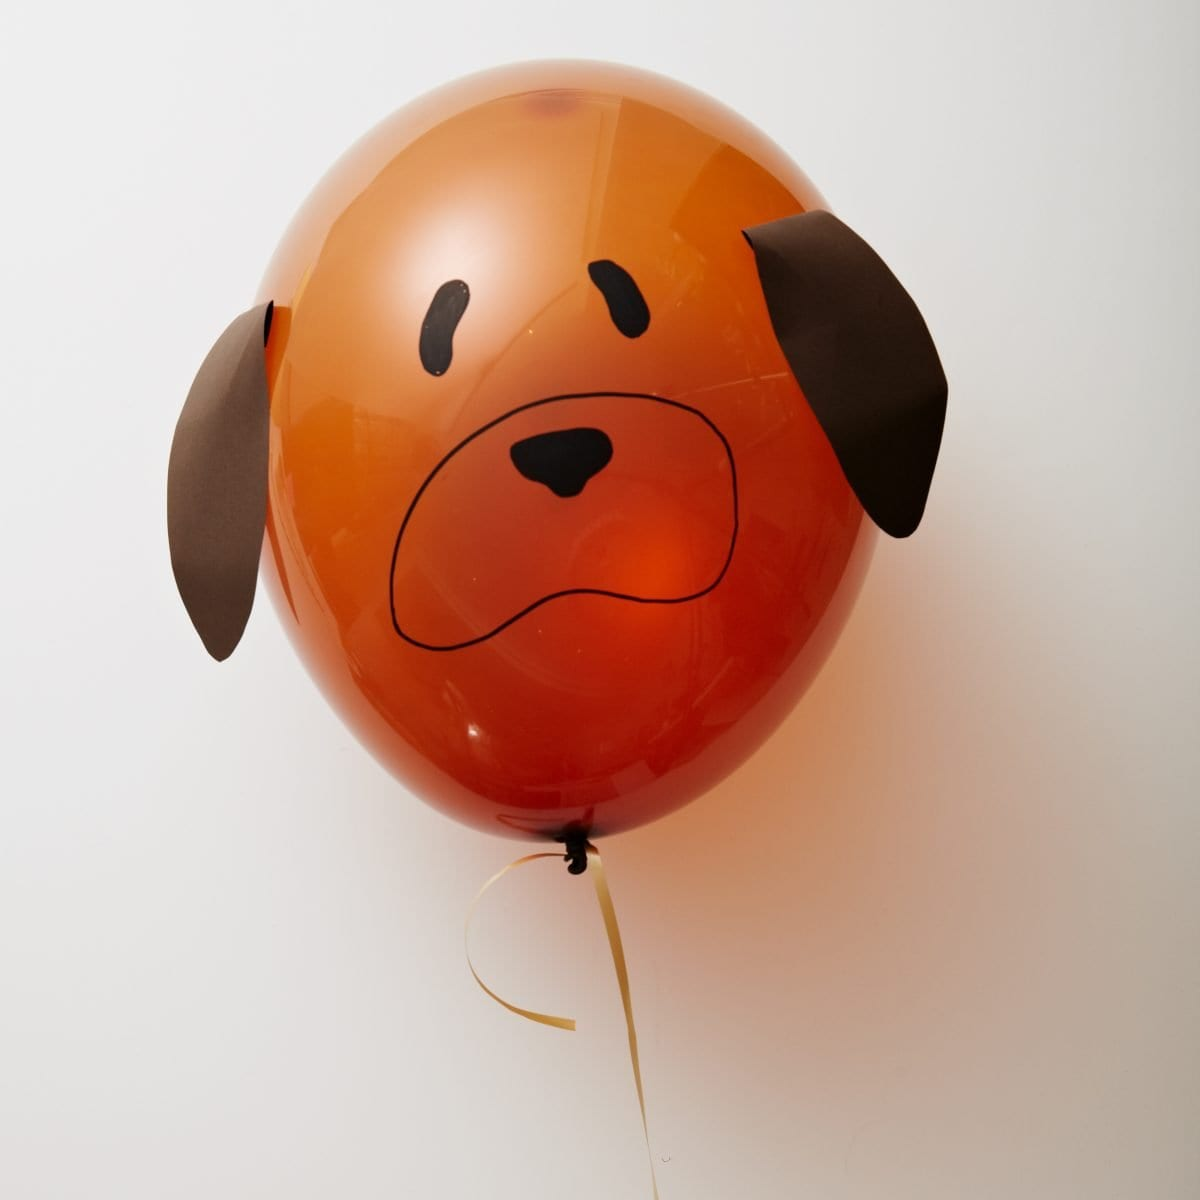 Darcy Miller Designs, Camp Darcy, Balloons